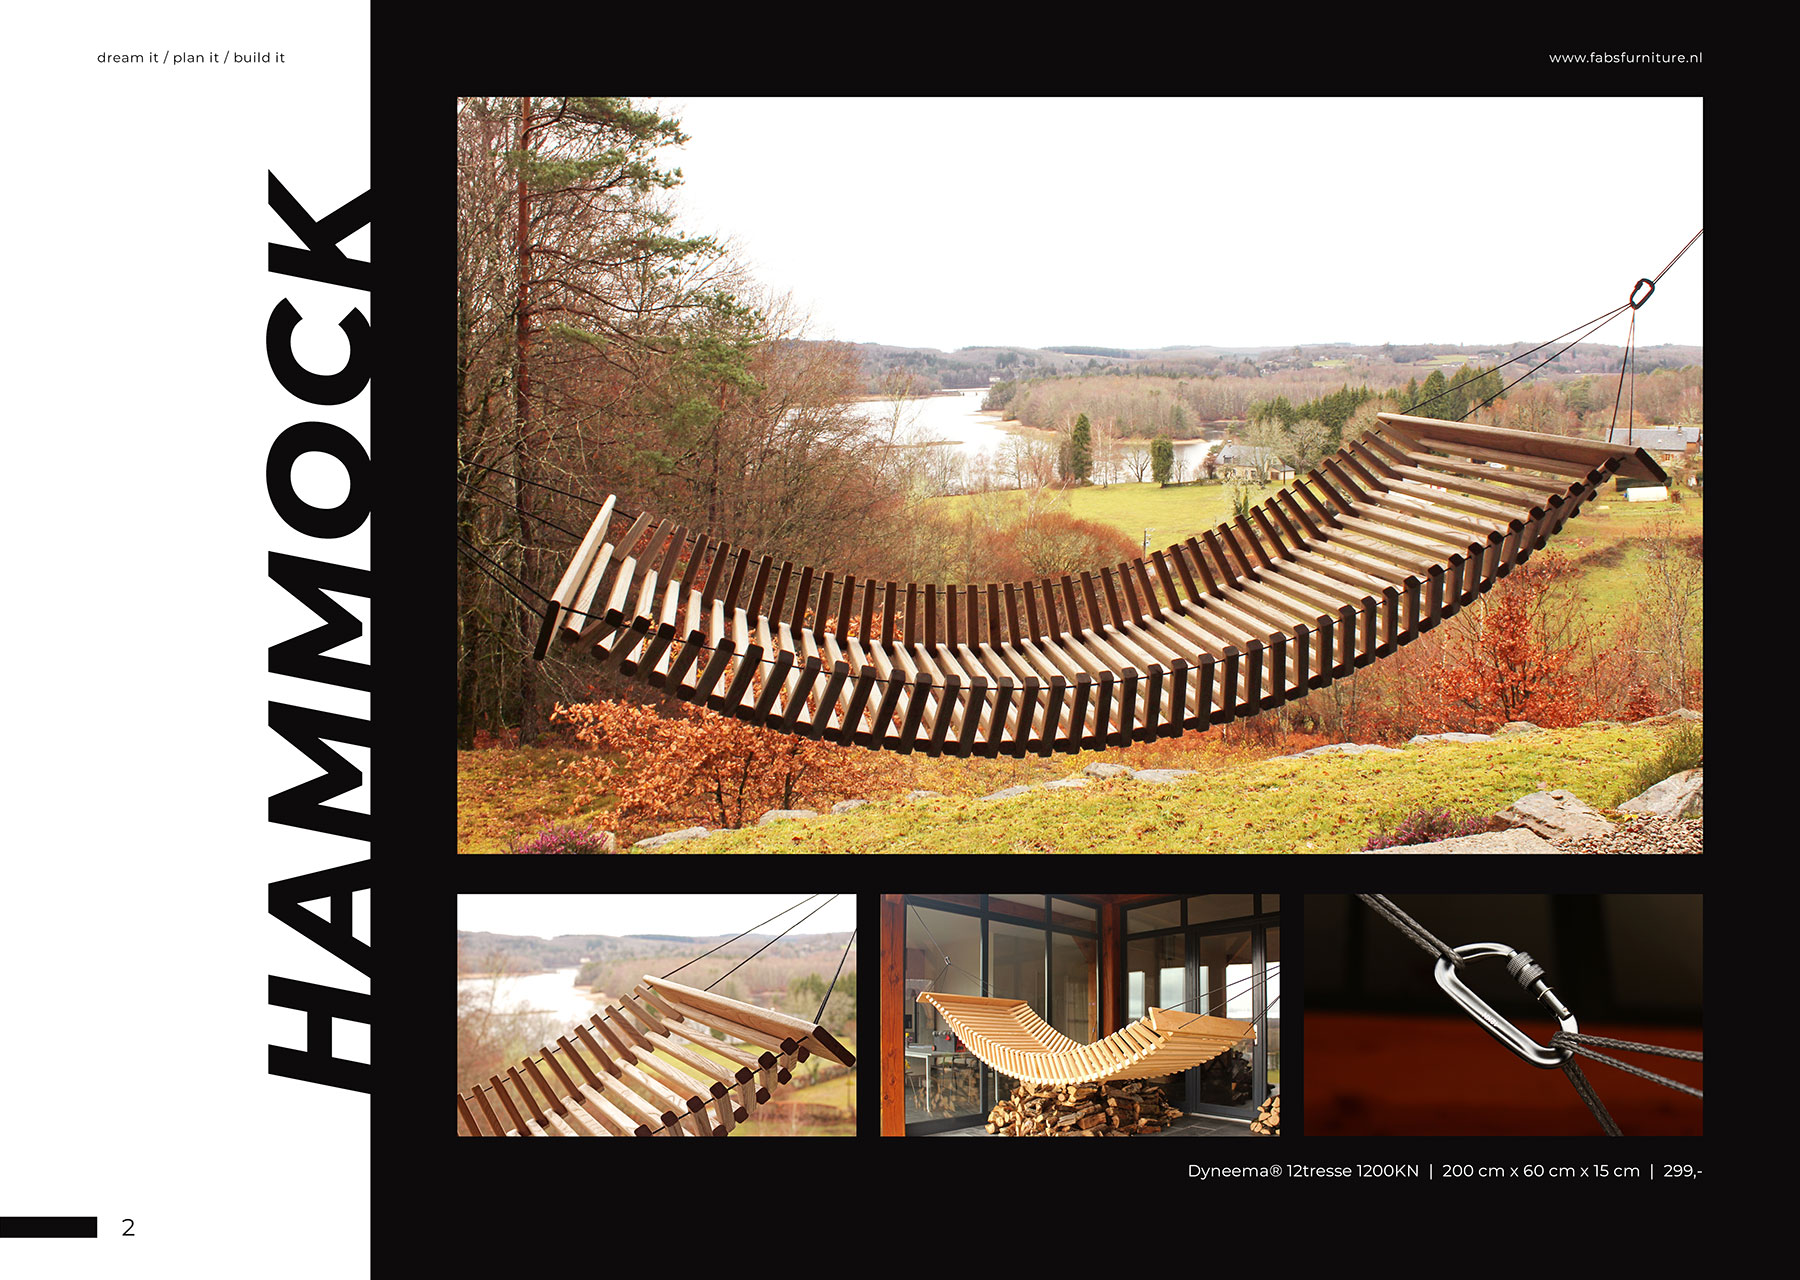 FabsFurniture Europe Portfolio - 2021 - wooden hammock